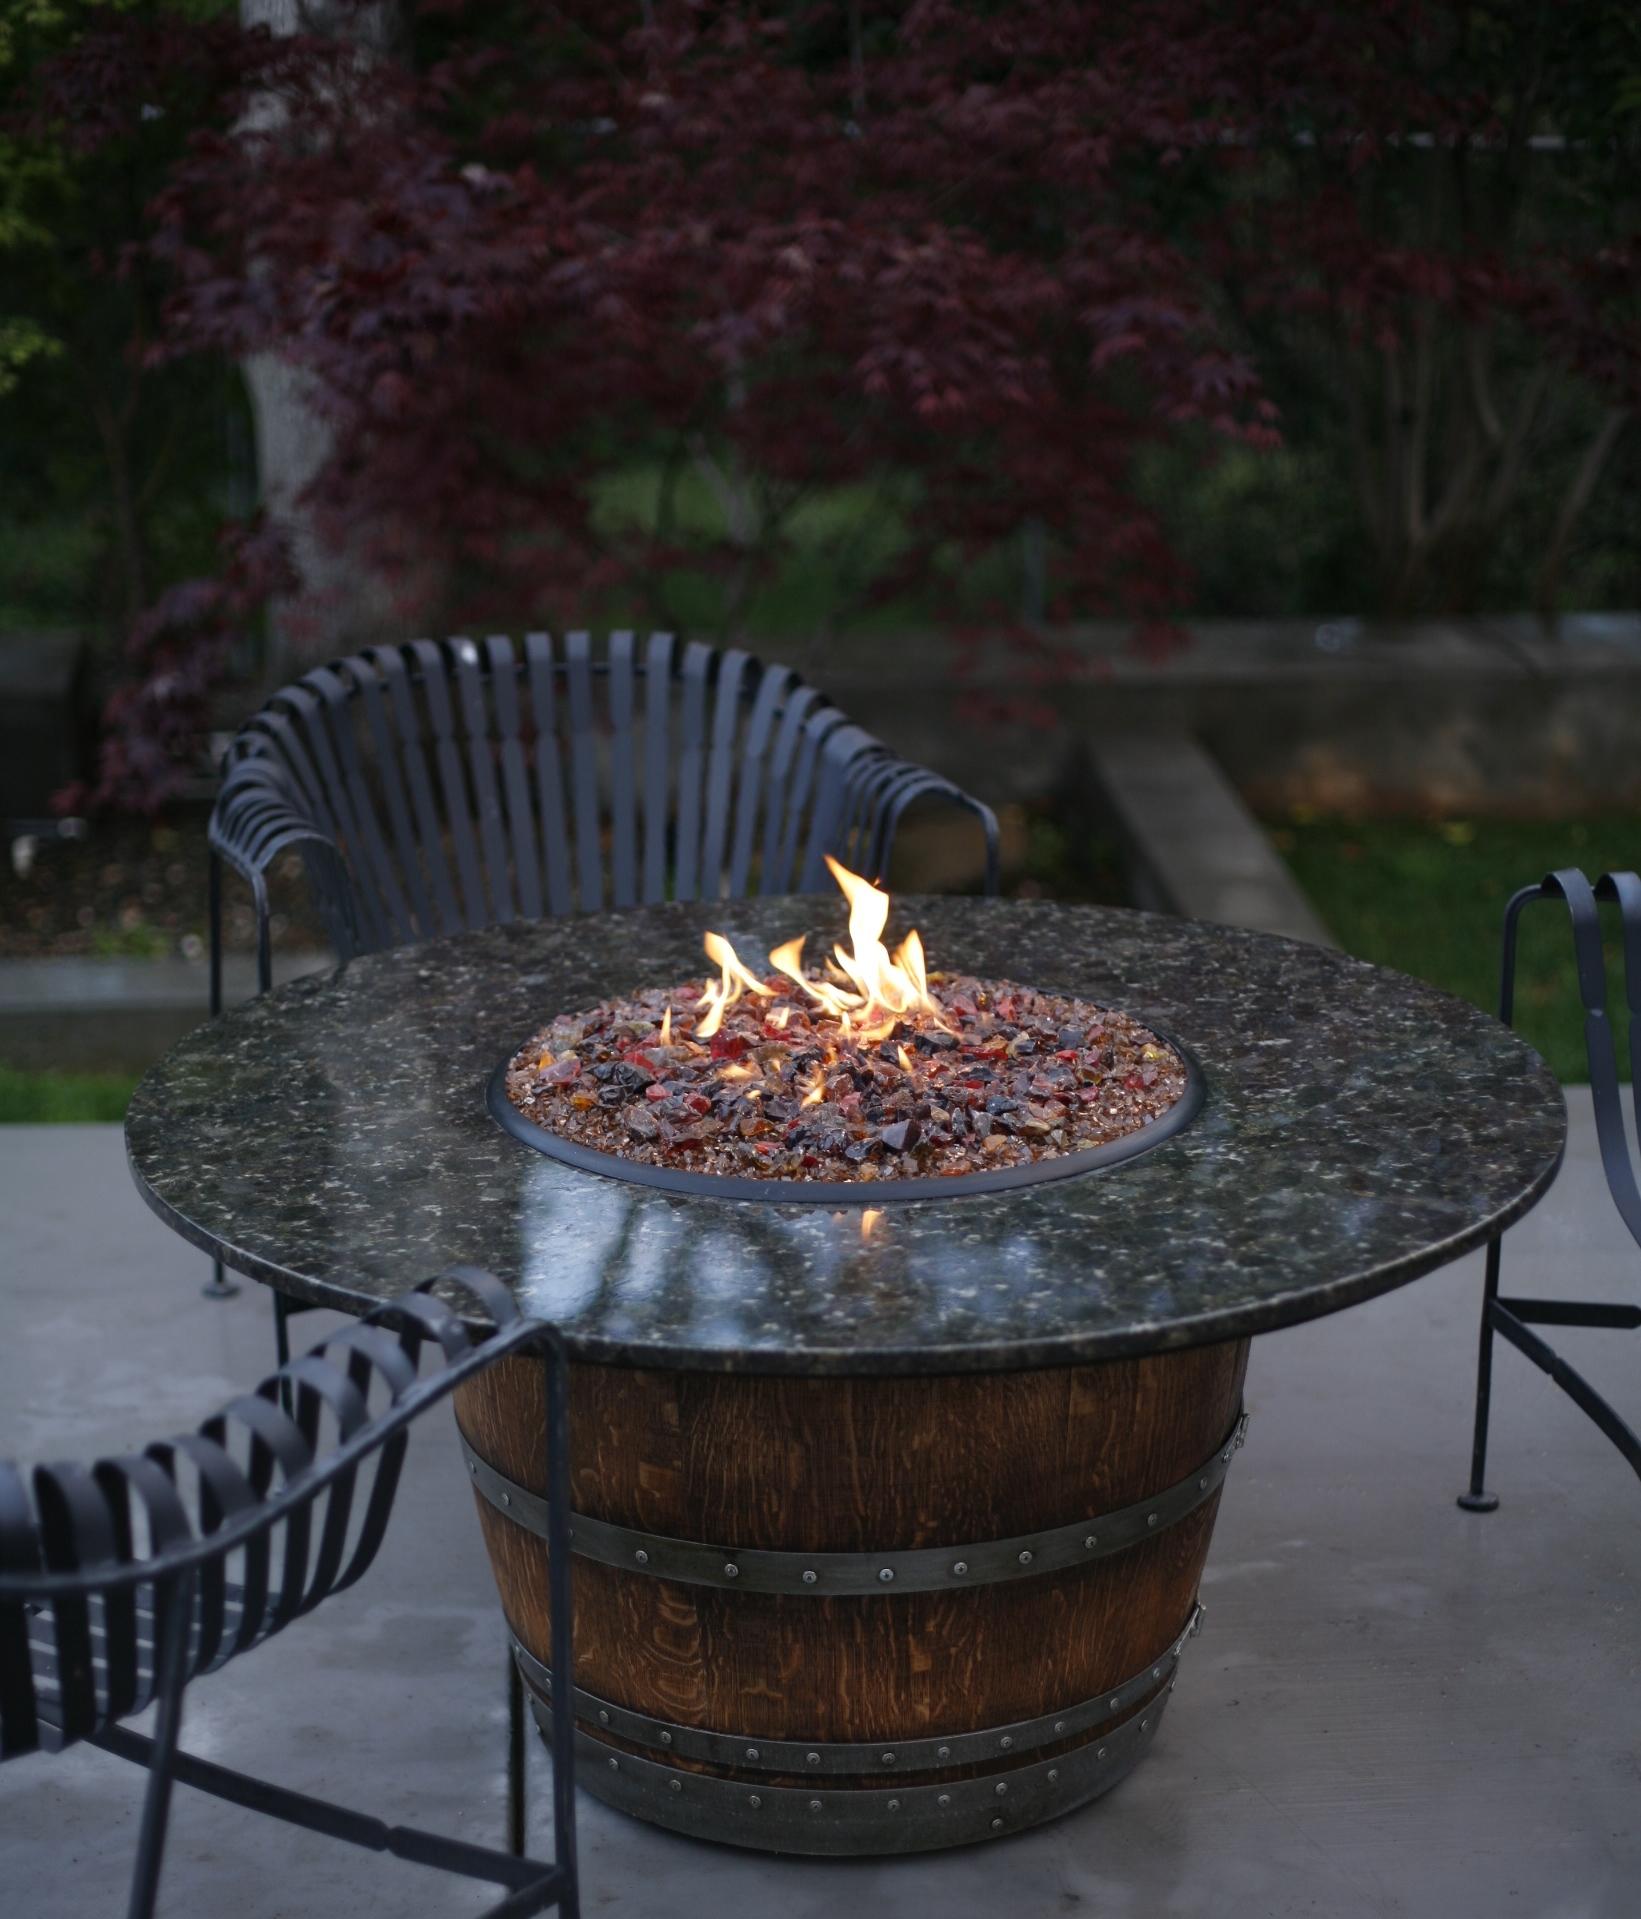 Fireplace Store Santa Rosa Unique Outdoor Fireplaces – Fire Santa Rosa